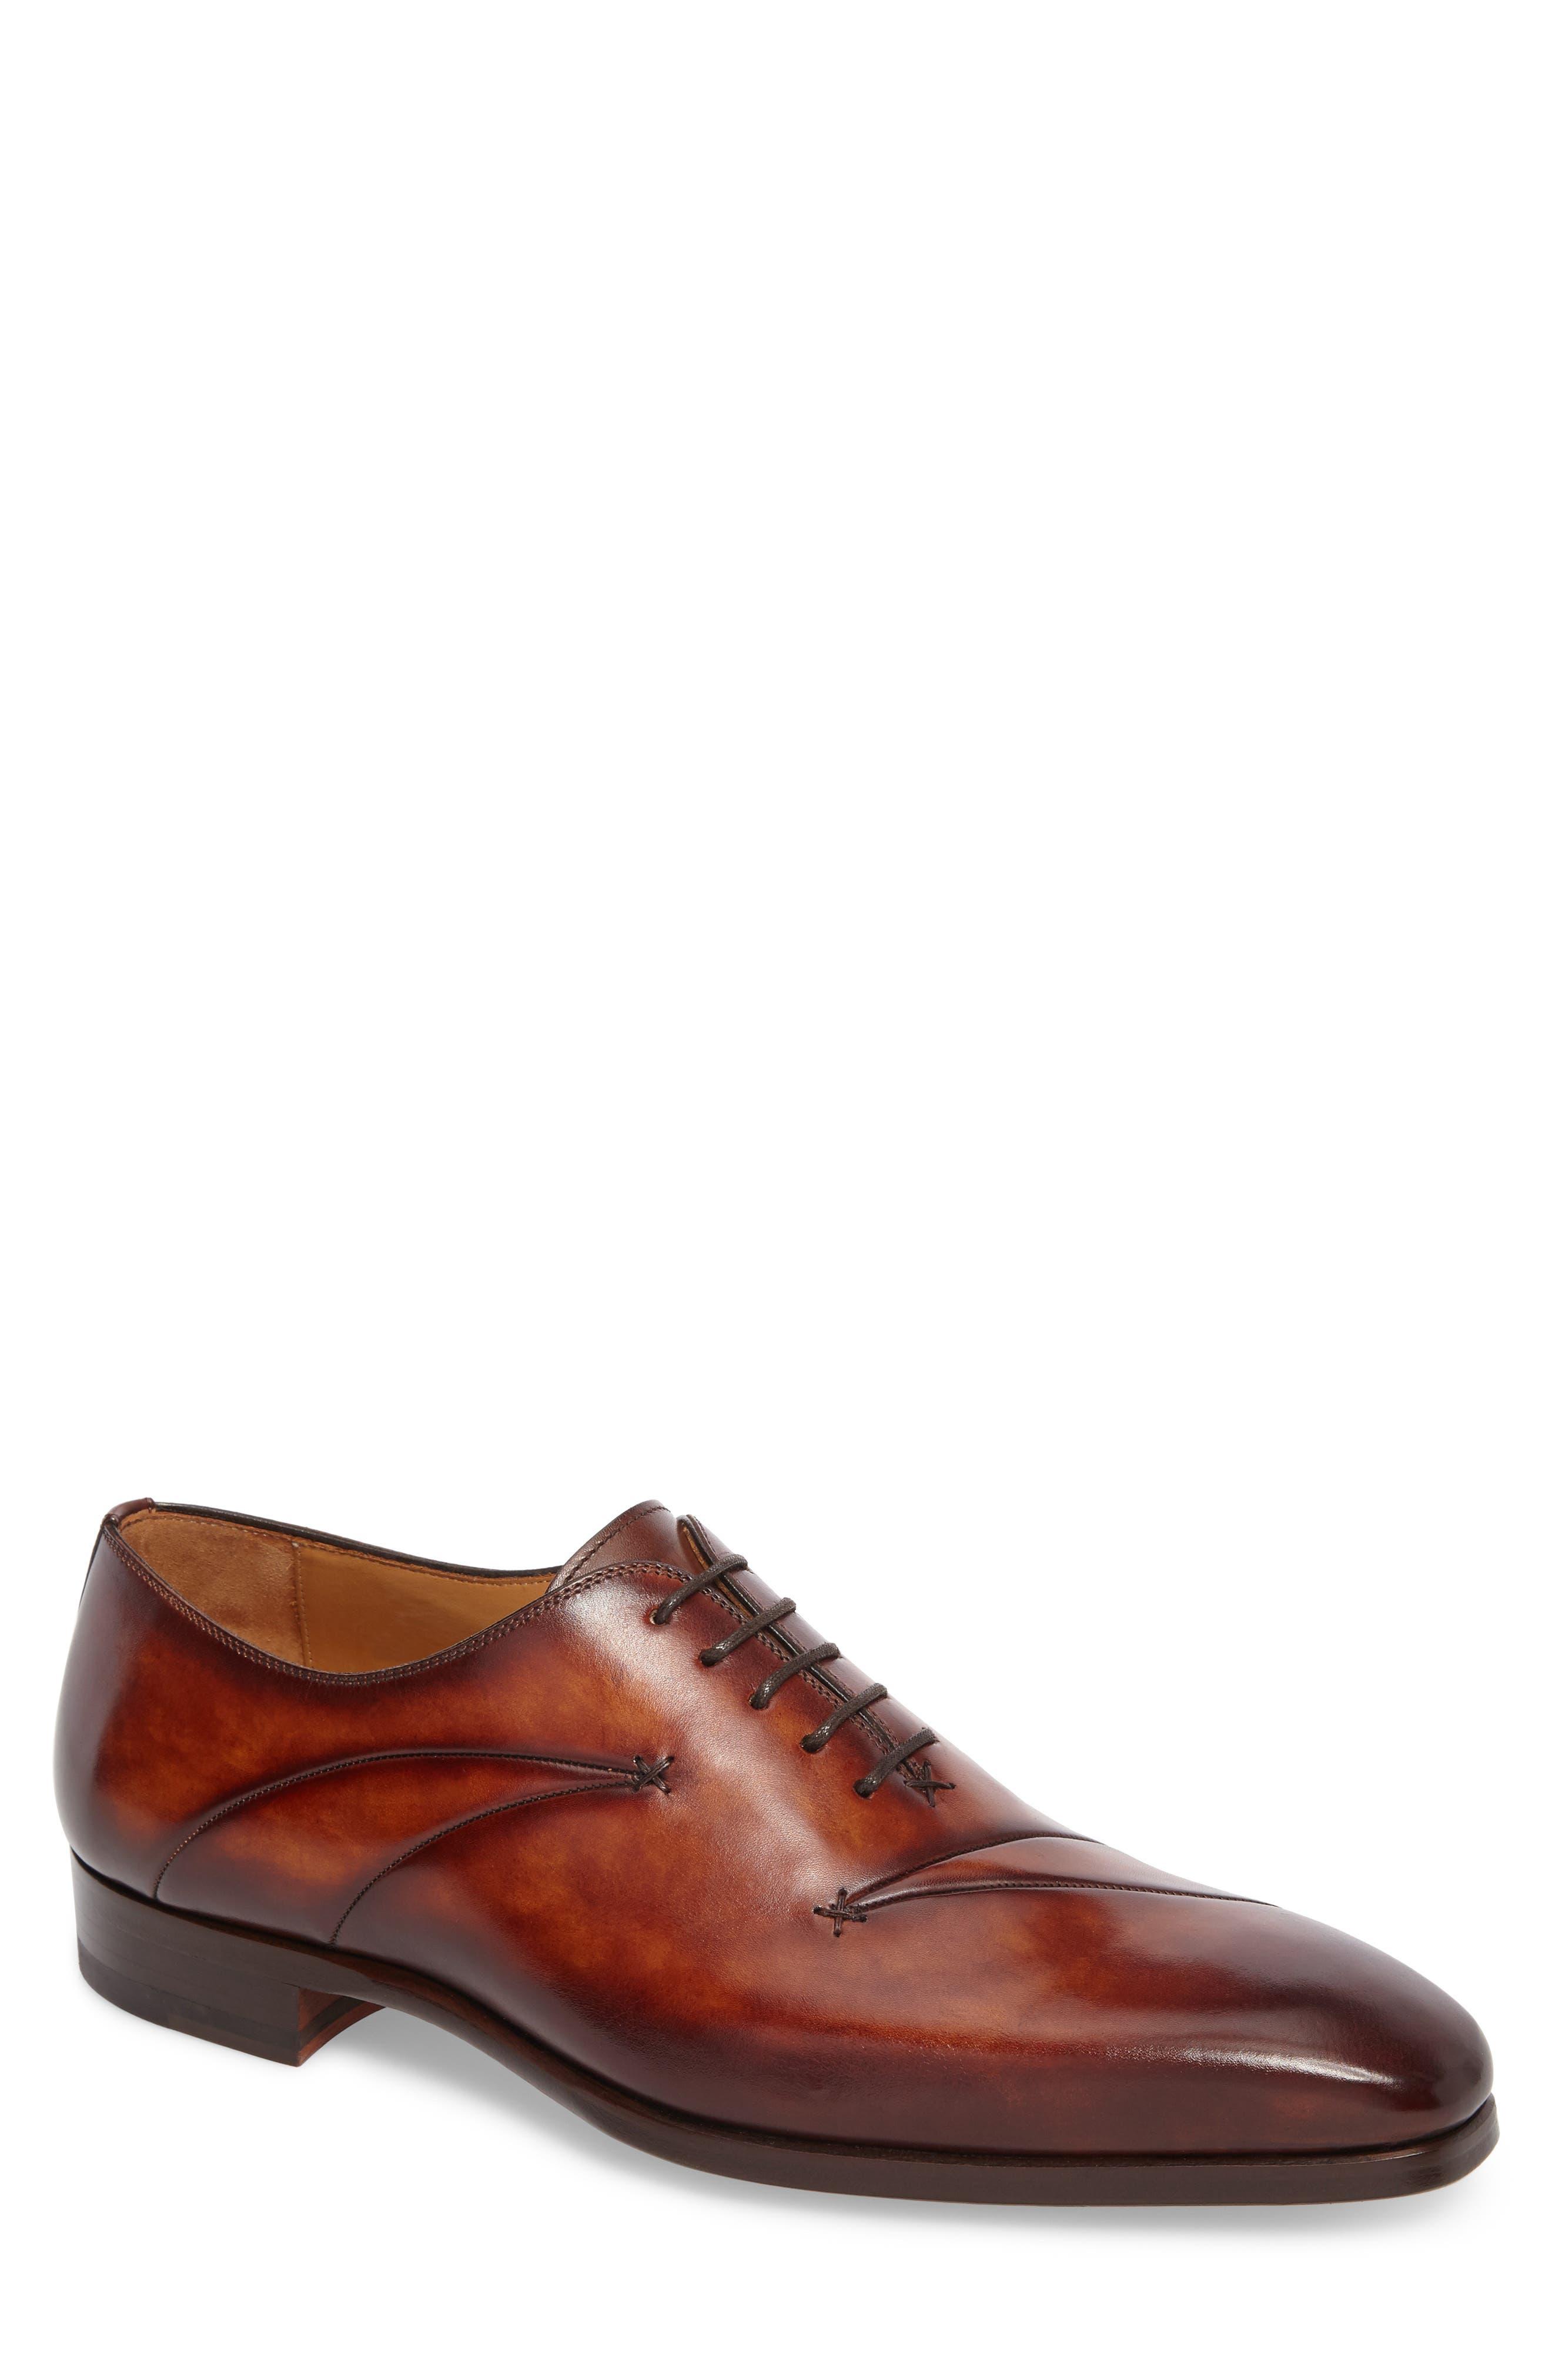 Magnanni Marquez Stitched Oxford (Men)